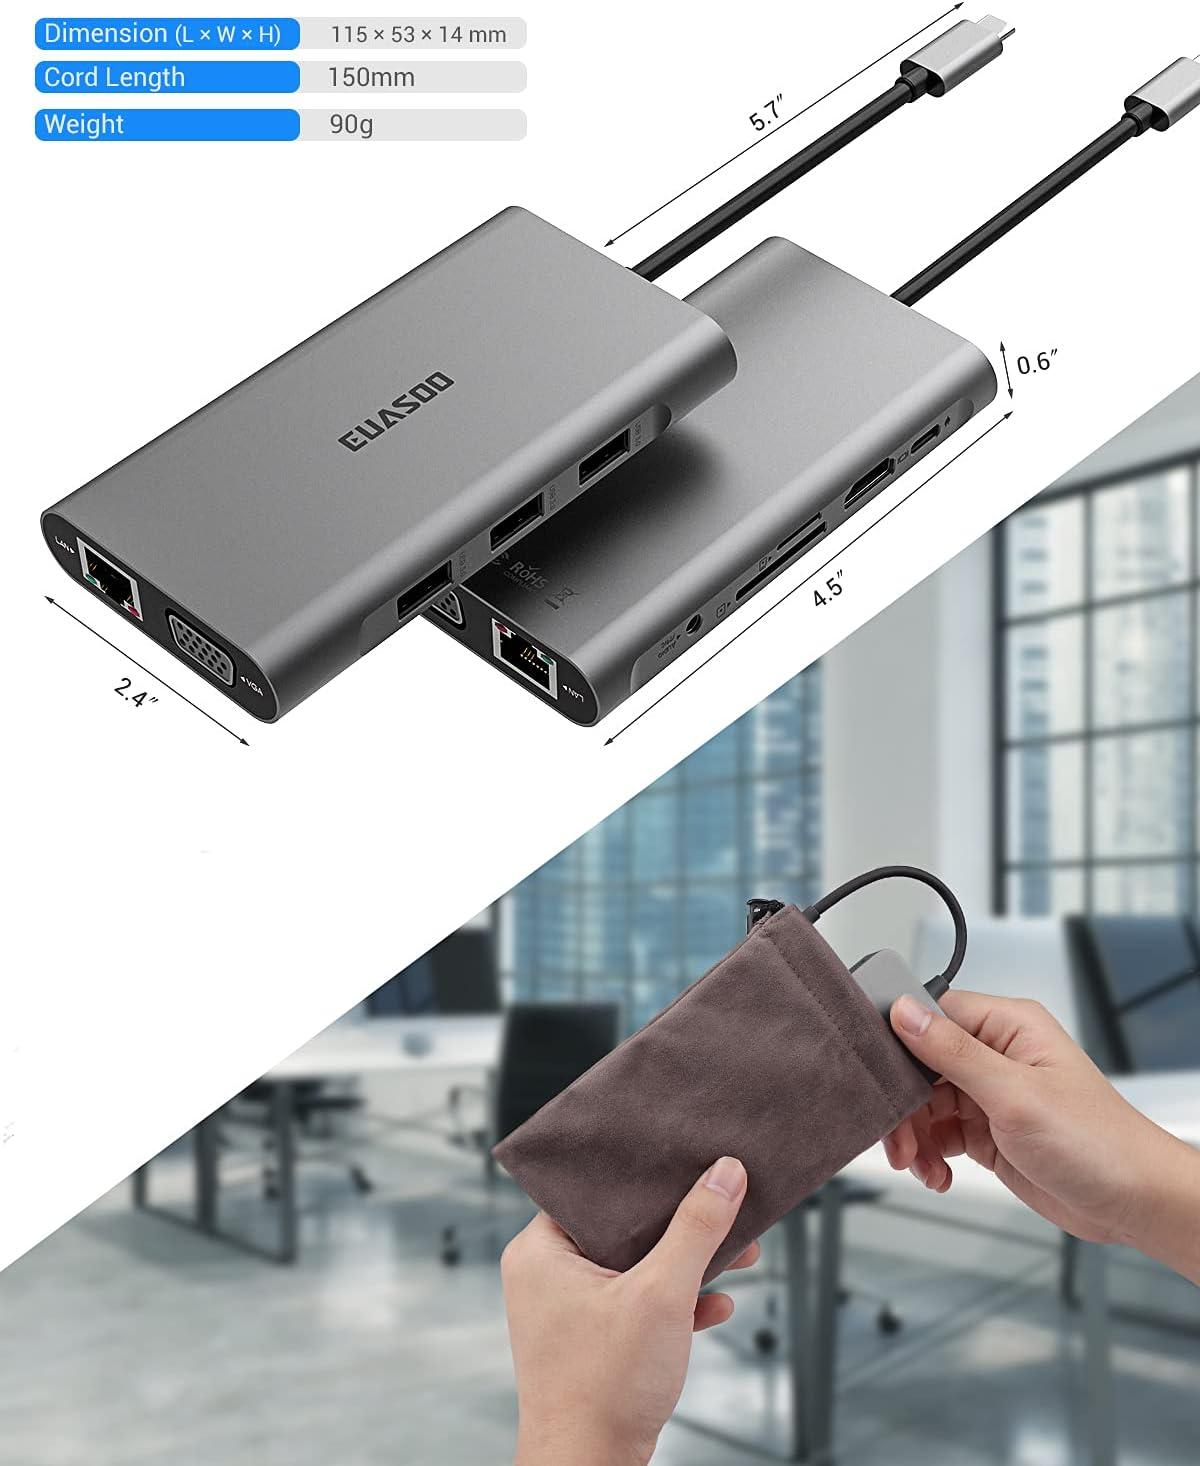 USB C Hub,Type C Hub,EUASOO 10 in 1 Adapter with 1000M RJ45 Ethernet, 4K HDMI, VGA, USB 3.0 Ports, PD 2.0 Charging Port, Card Reader, Audio Mic Por for MacBook Pro,Chromebook